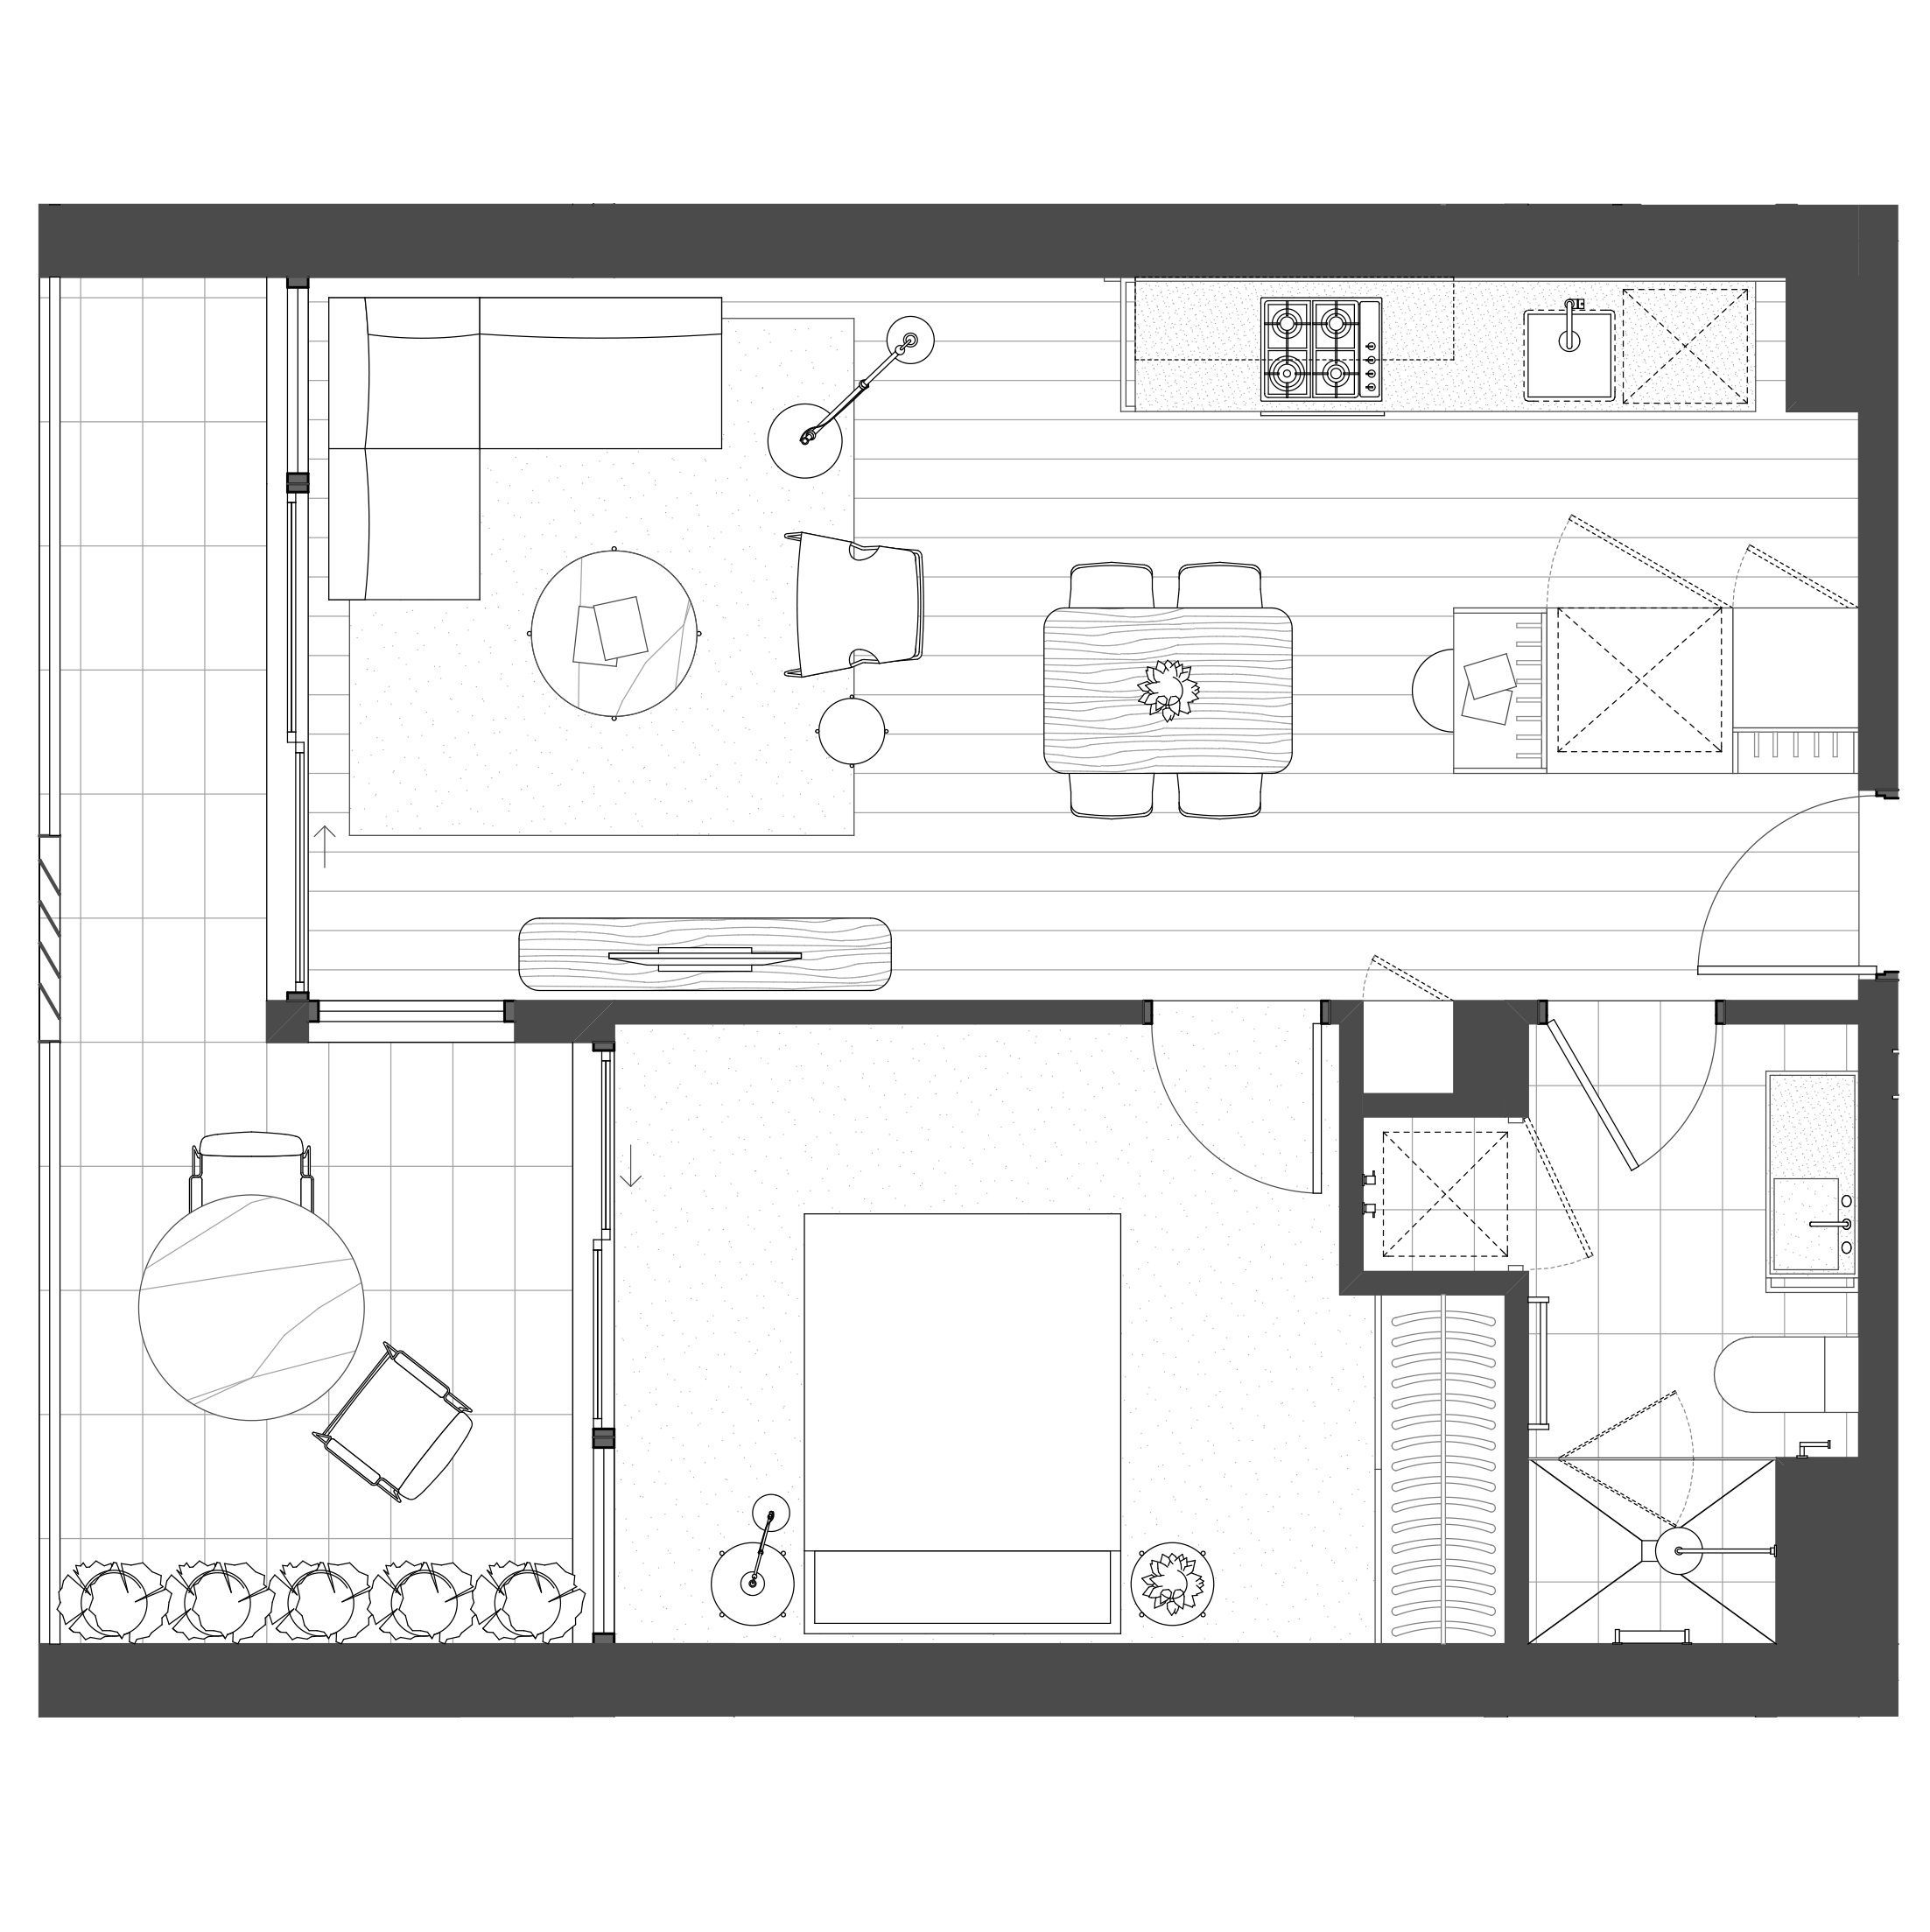 1 Bedroom, 1 Bathroom, 1 Carpark